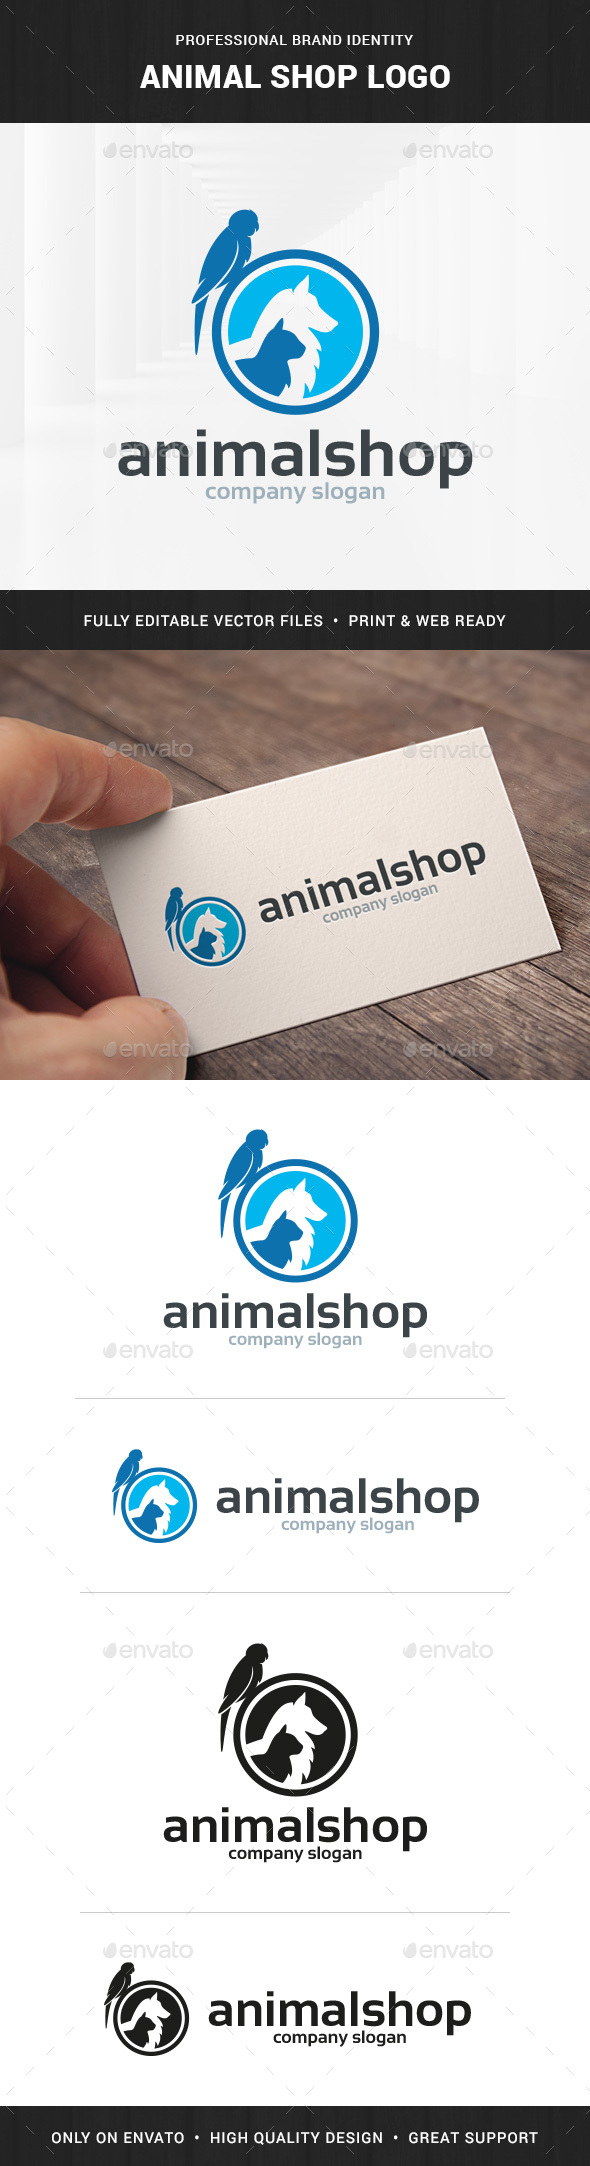 Animal Shop Logo Template - Animals Logo Templates